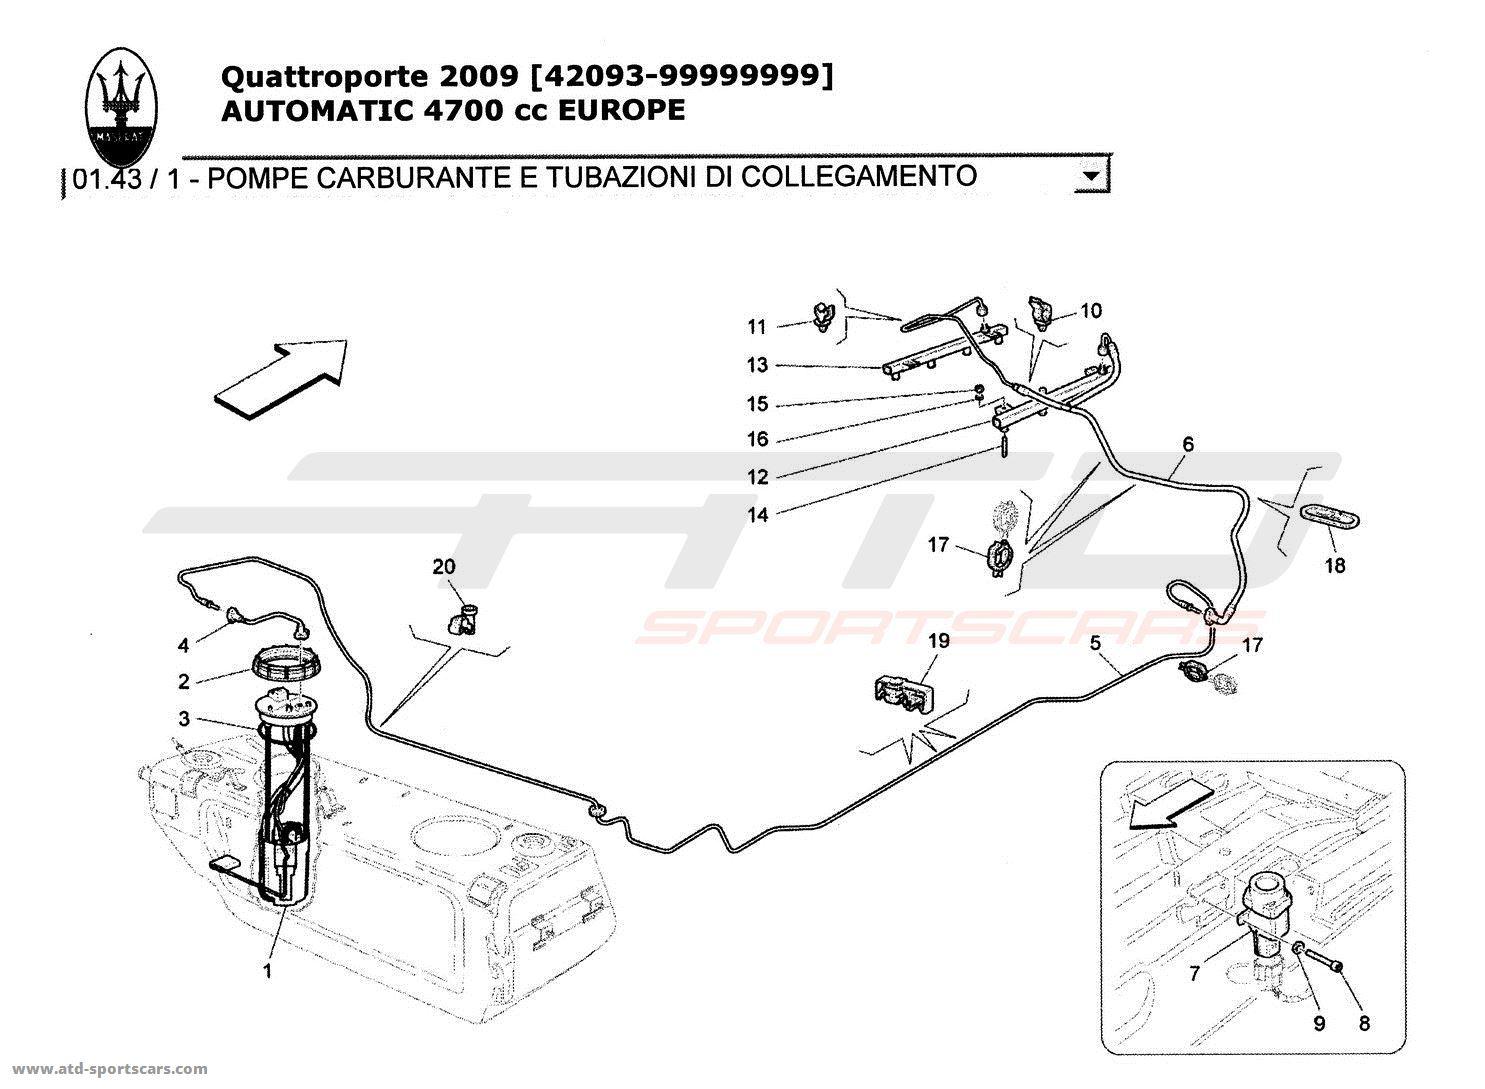 Maserati Quattroporte 4 7l Boite Auto Fuel Pumps And Connection Lines Parts At Atd